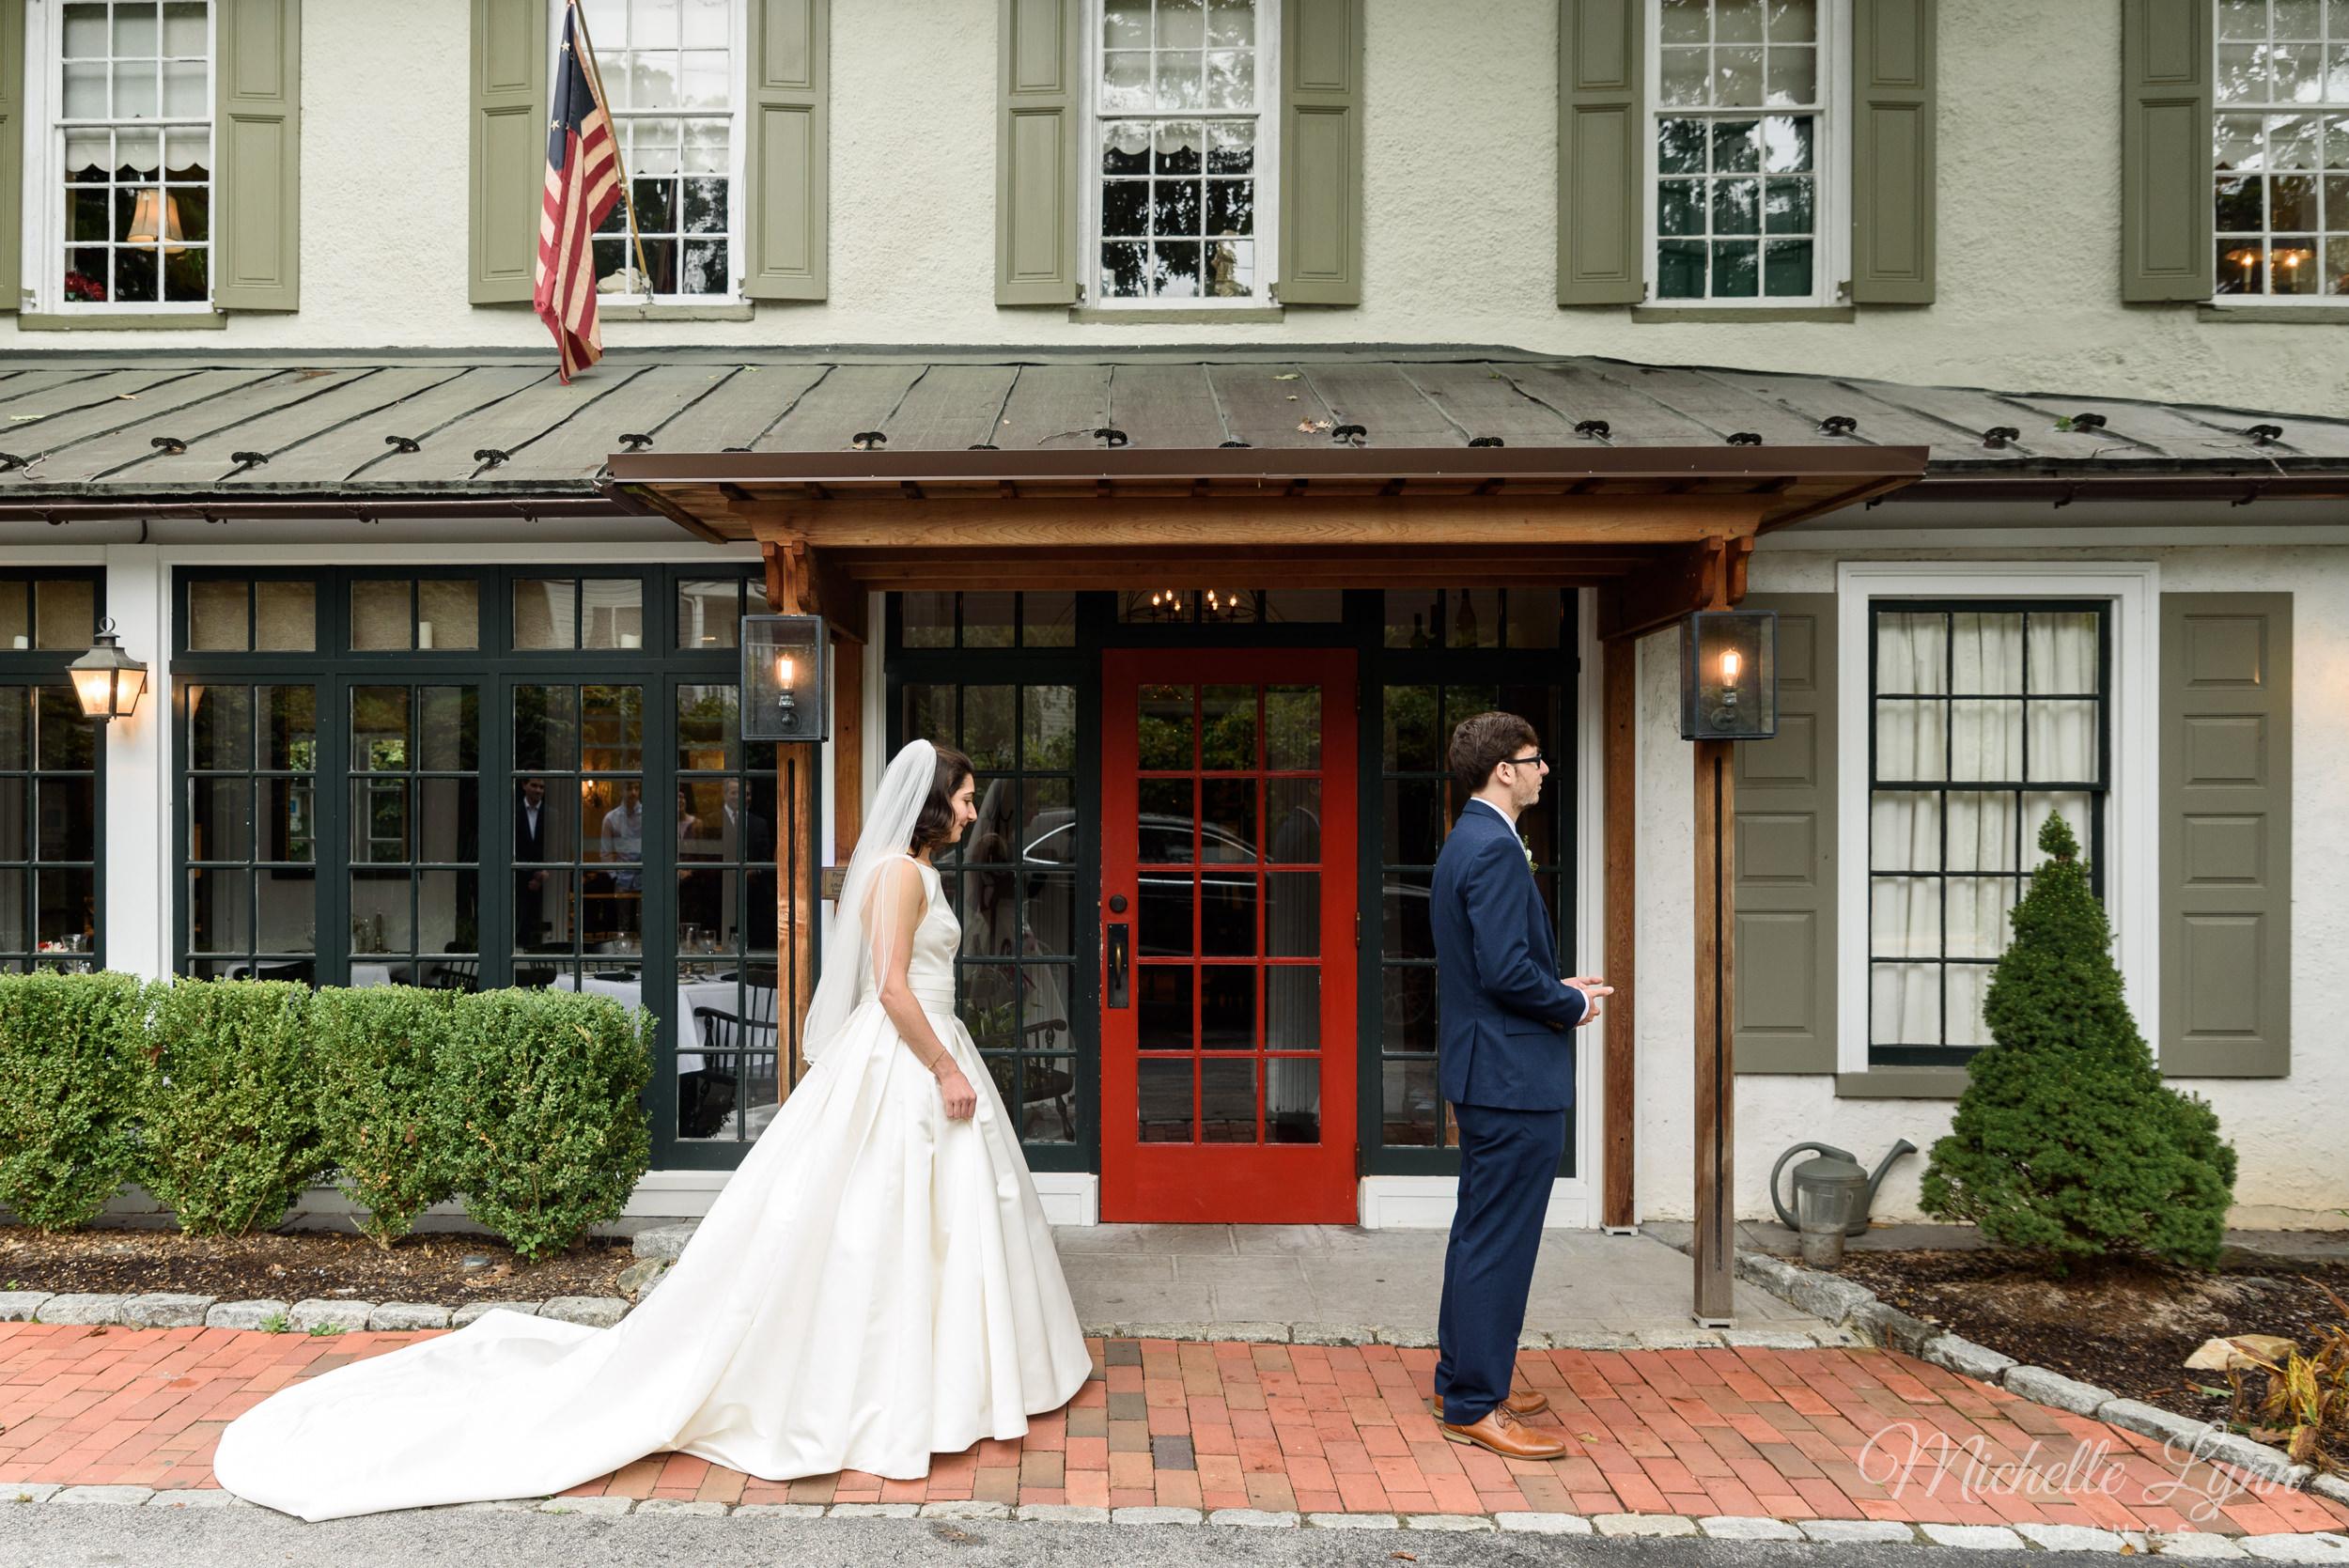 mlw-general-warren-malvern-wedding-photographer-9.jpg